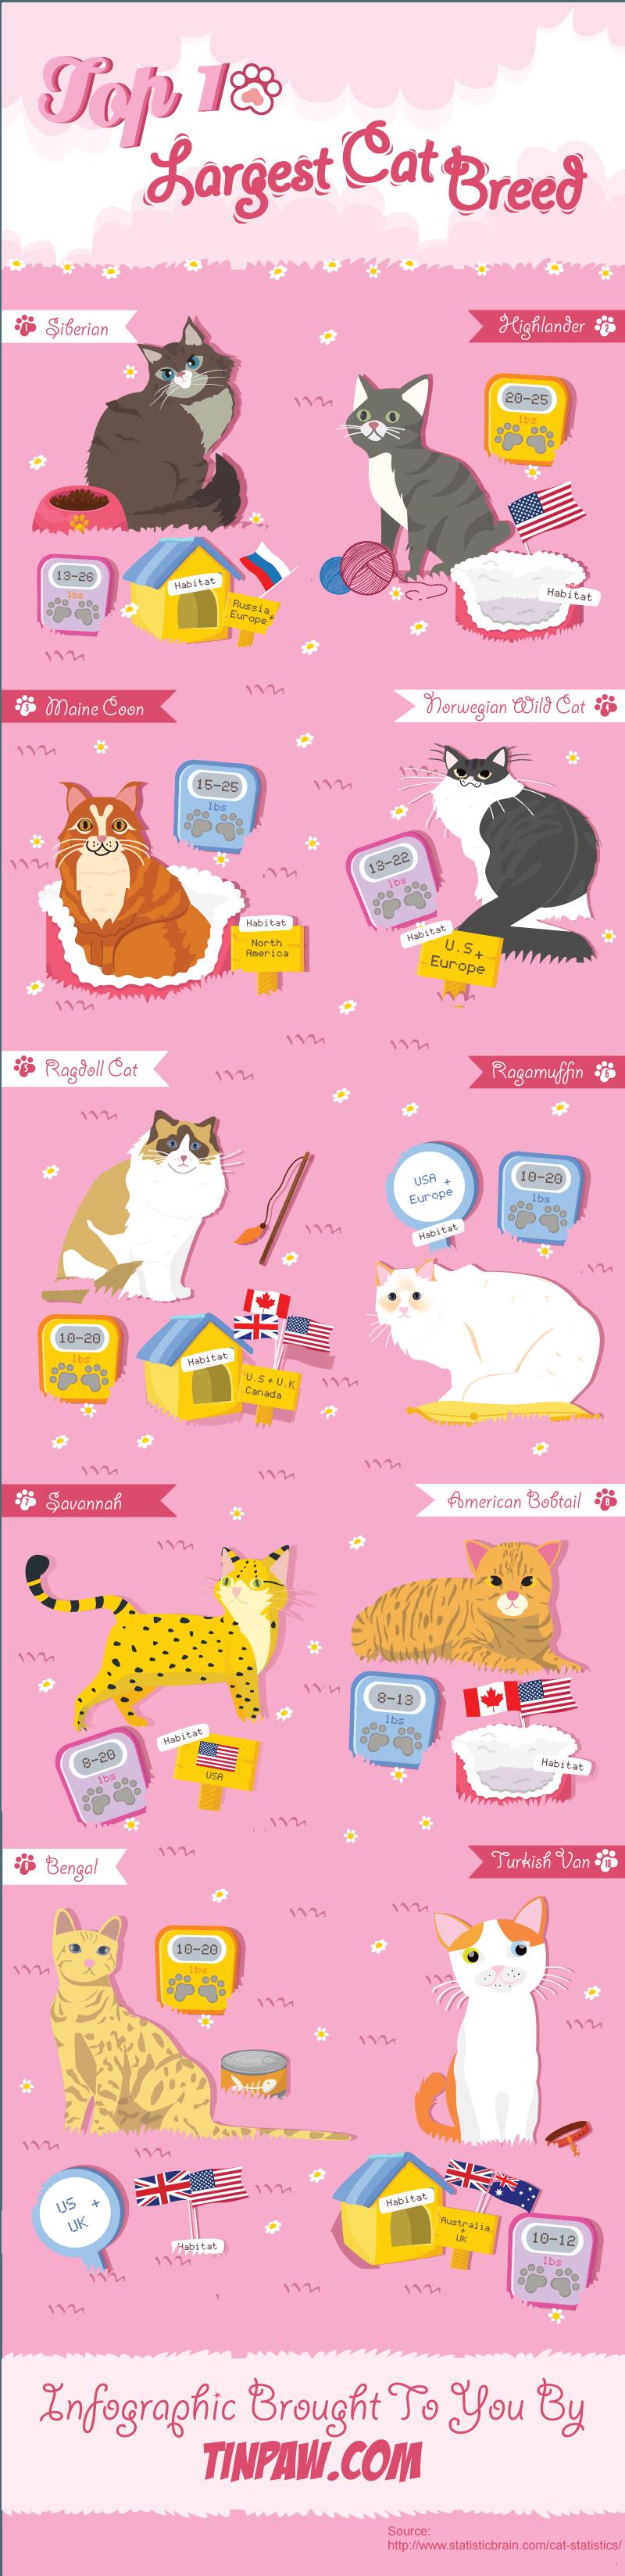 top 10 largest cat breeds